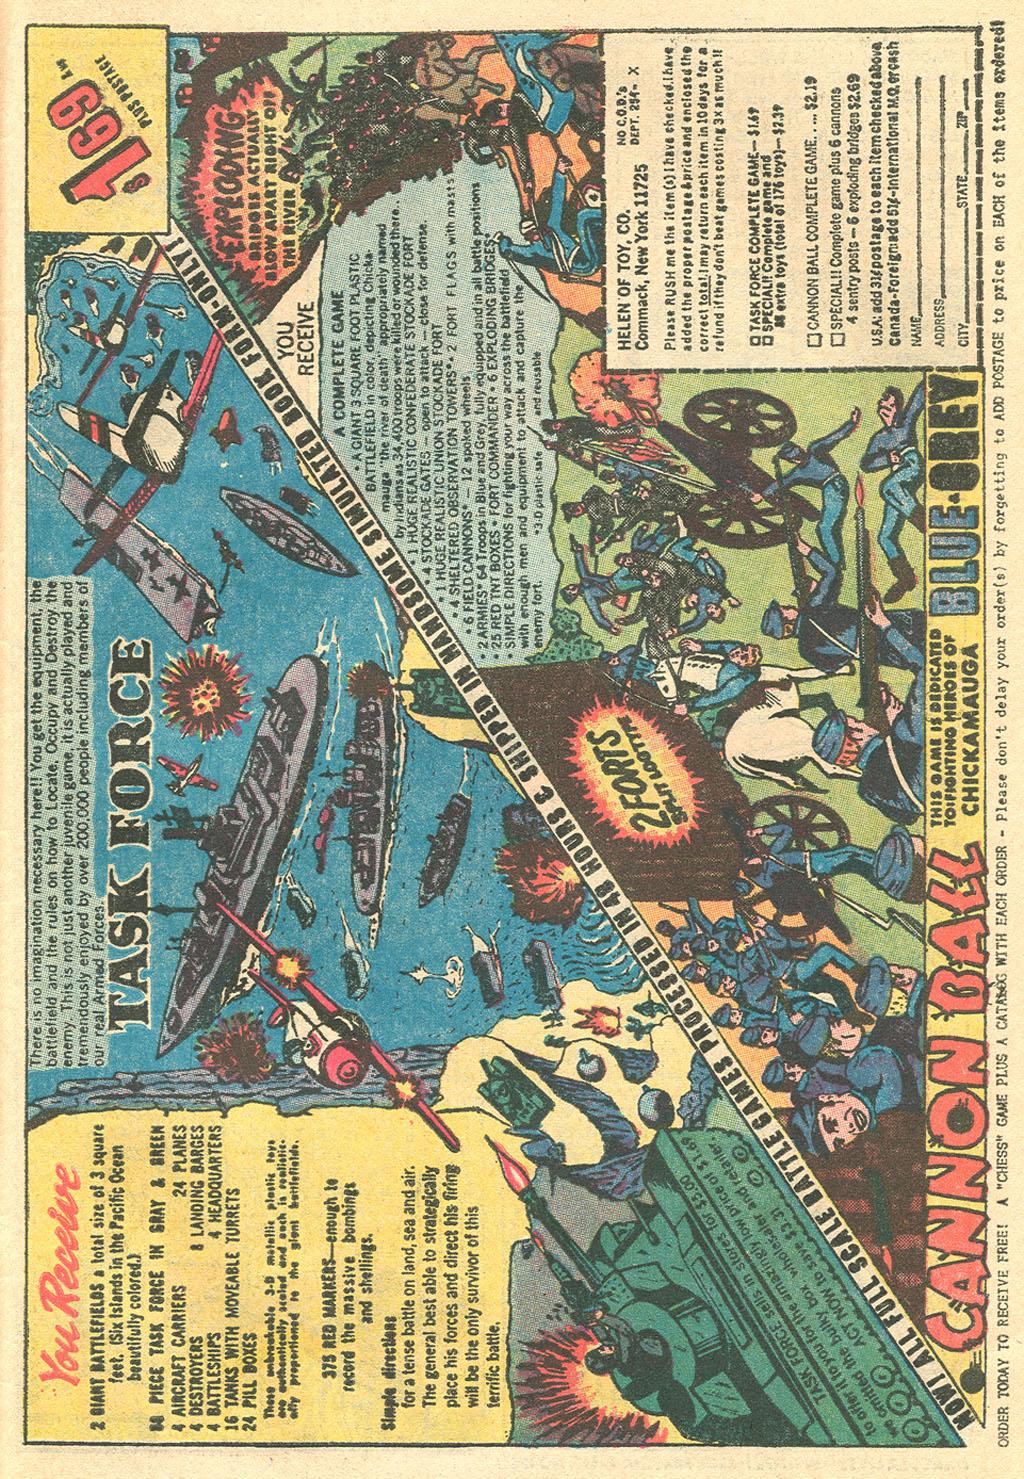 Read online Two-Gun Kid comic -  Issue #113 - 31